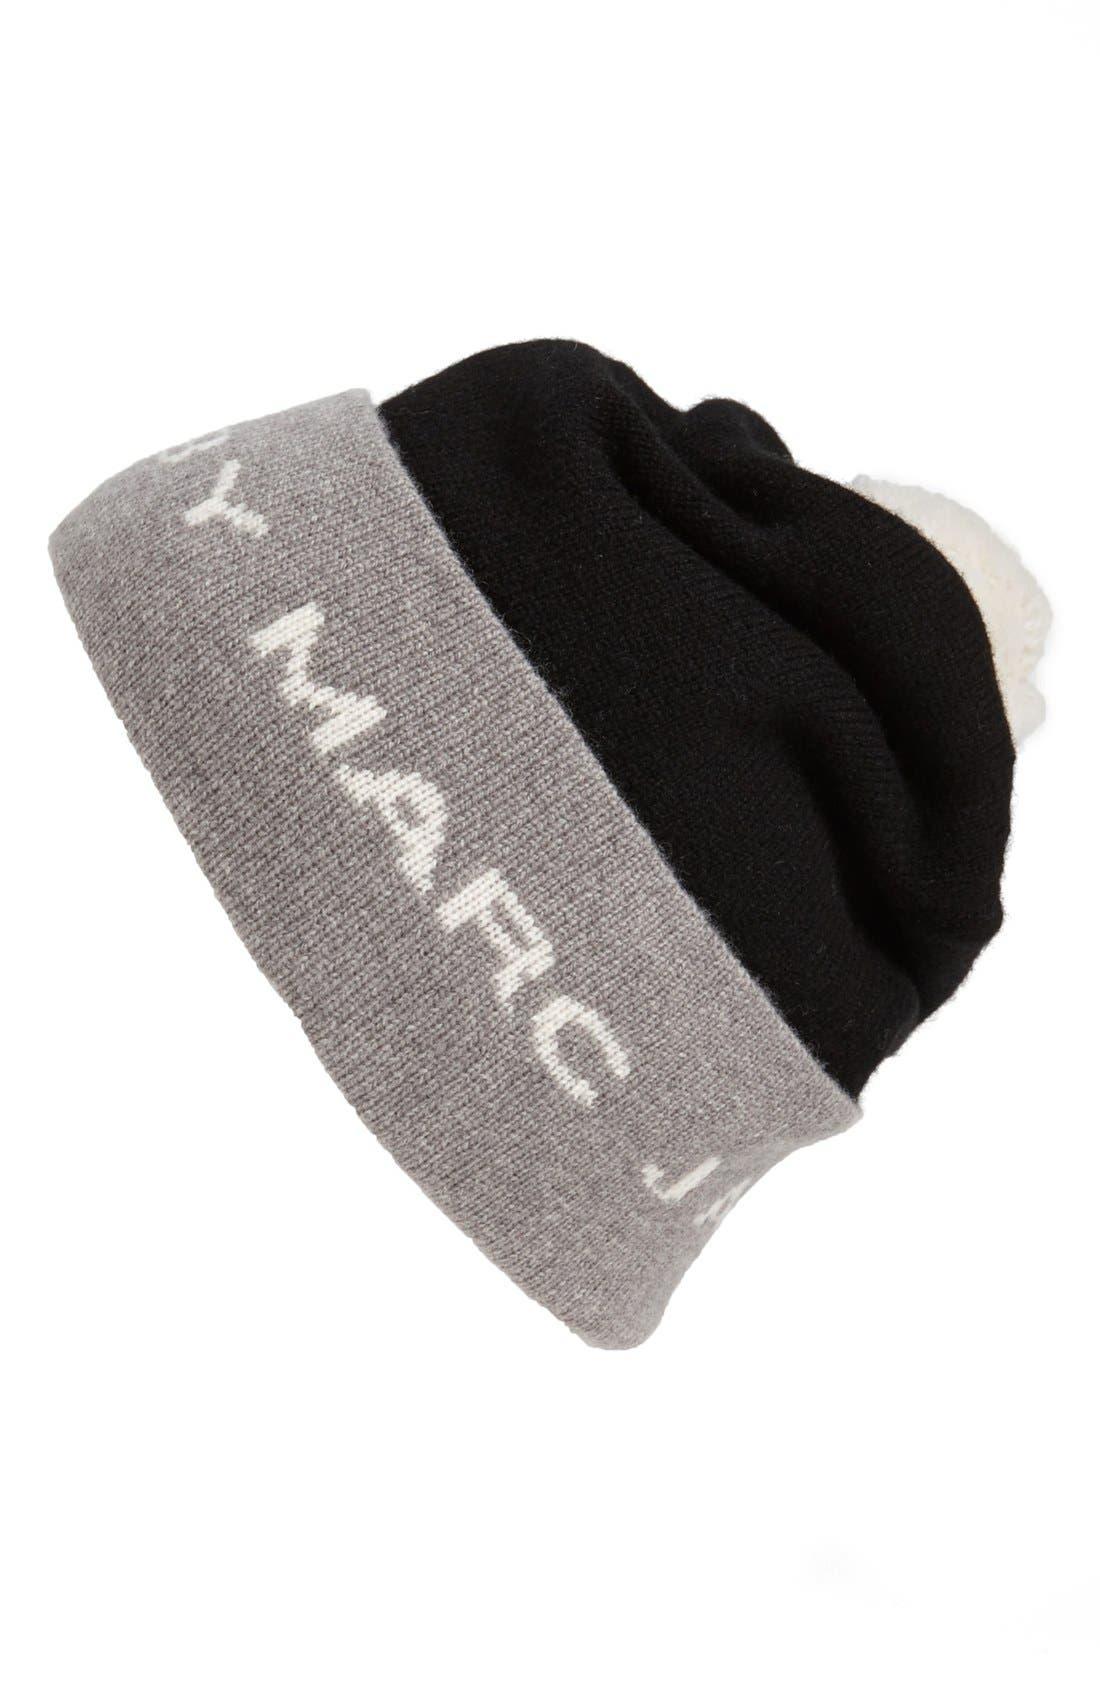 Main Image - MARC BY MARC JACOBS Logo Ski Hat